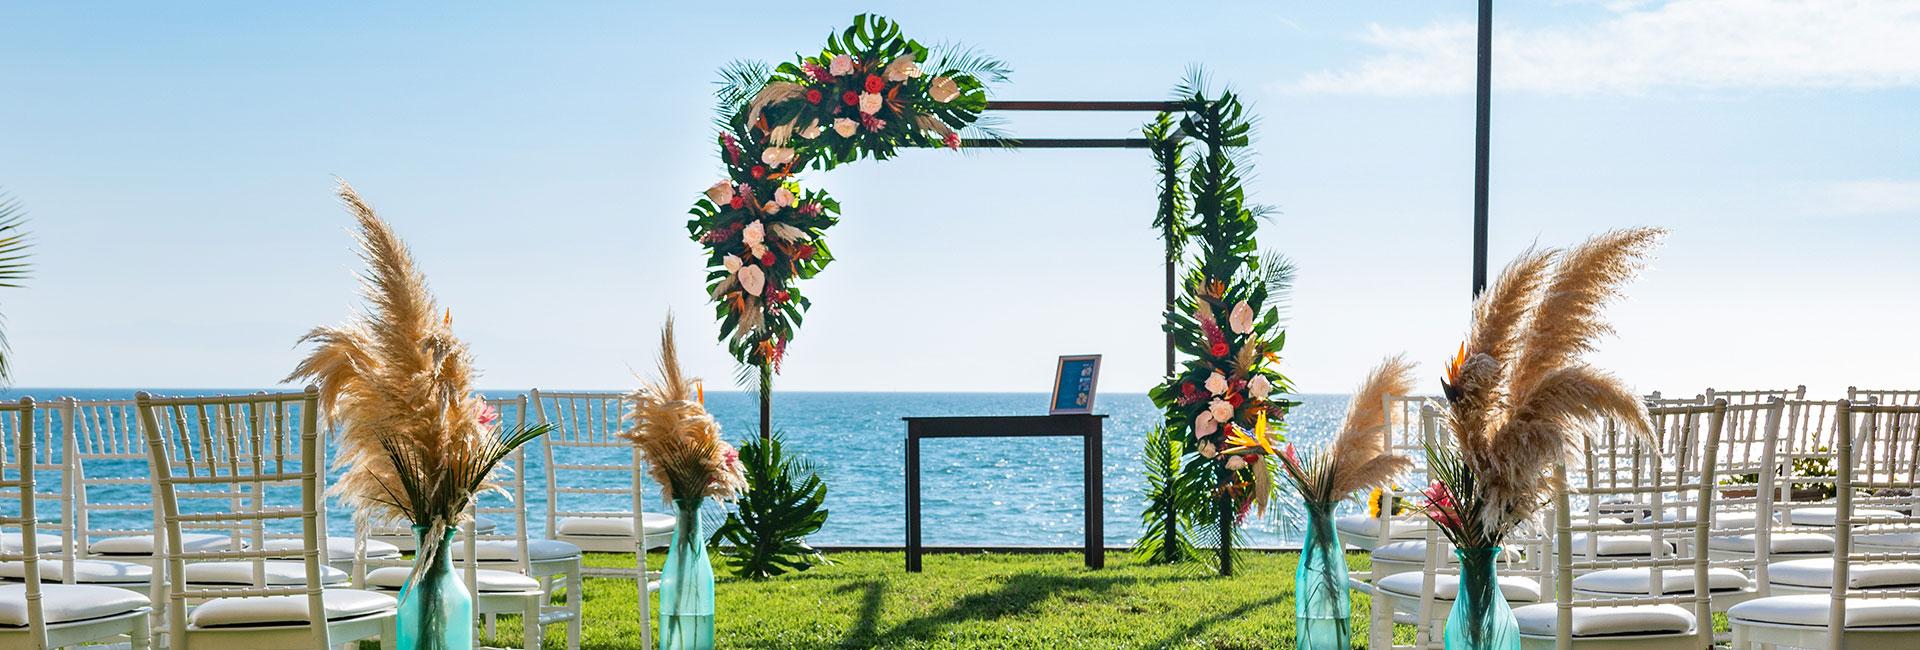 Beachfront wedding in riviera nayarit mexico